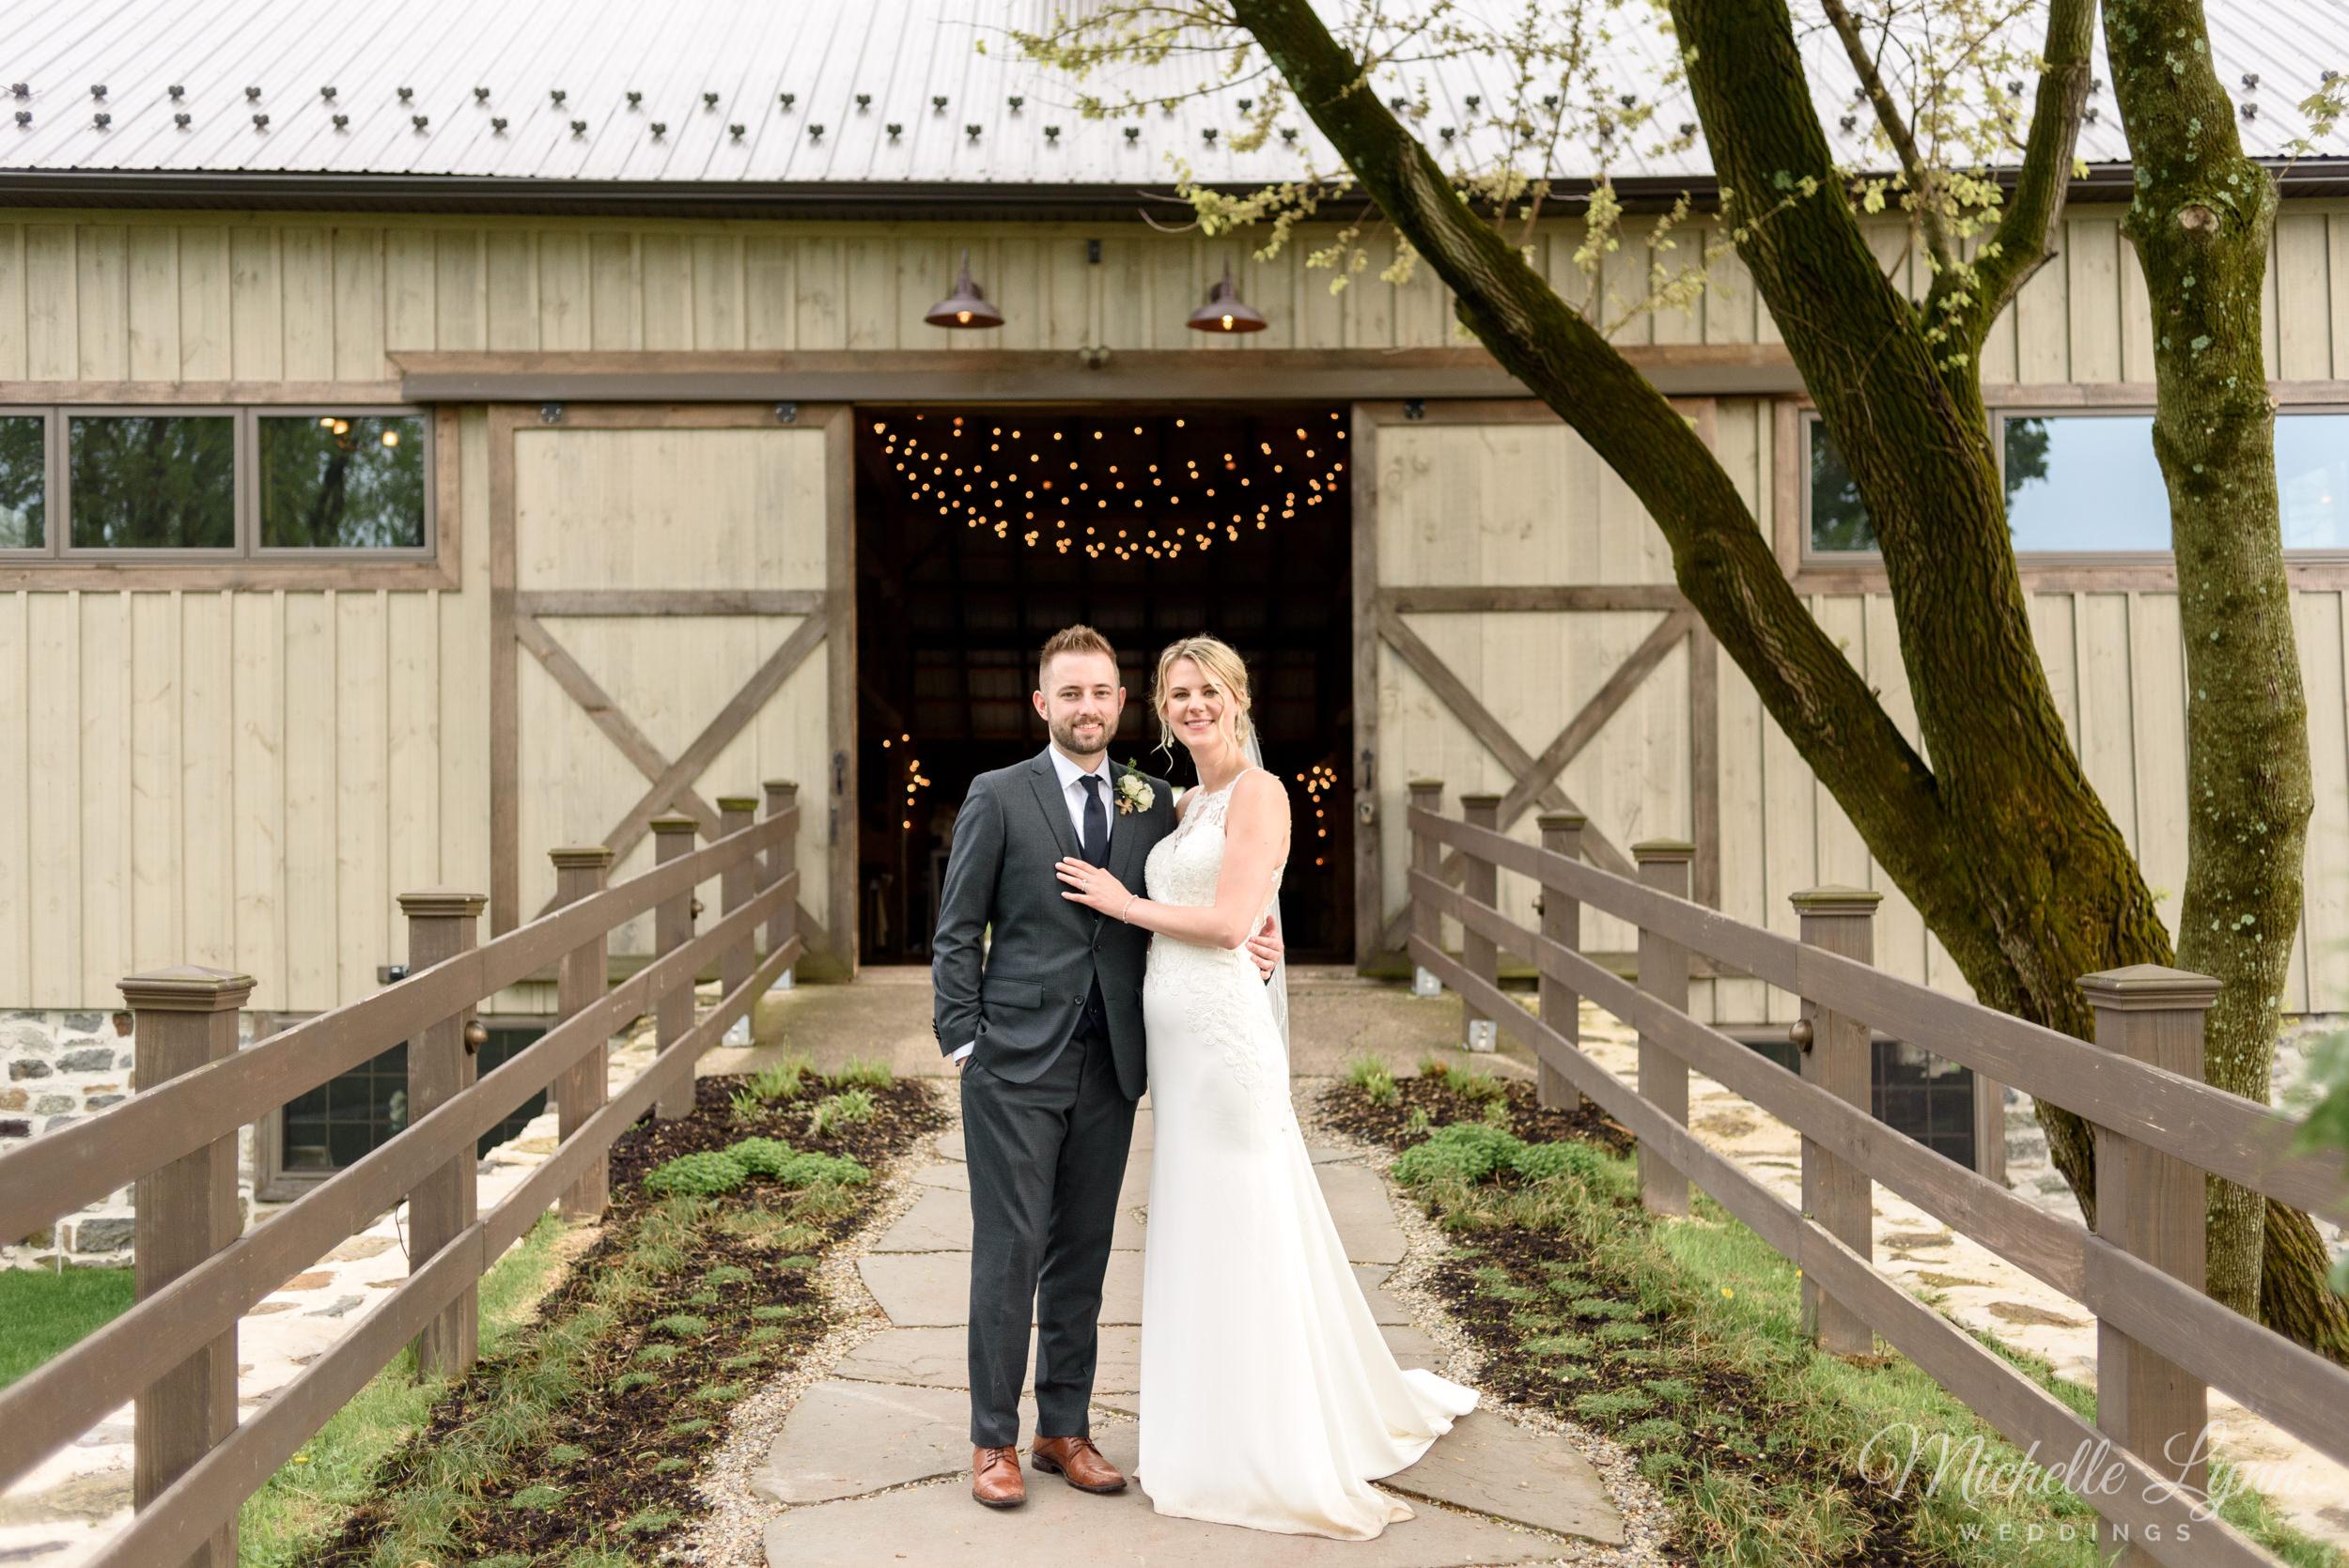 mlw-the-farm-bakery-and-events-wedding-photos-54.jpg